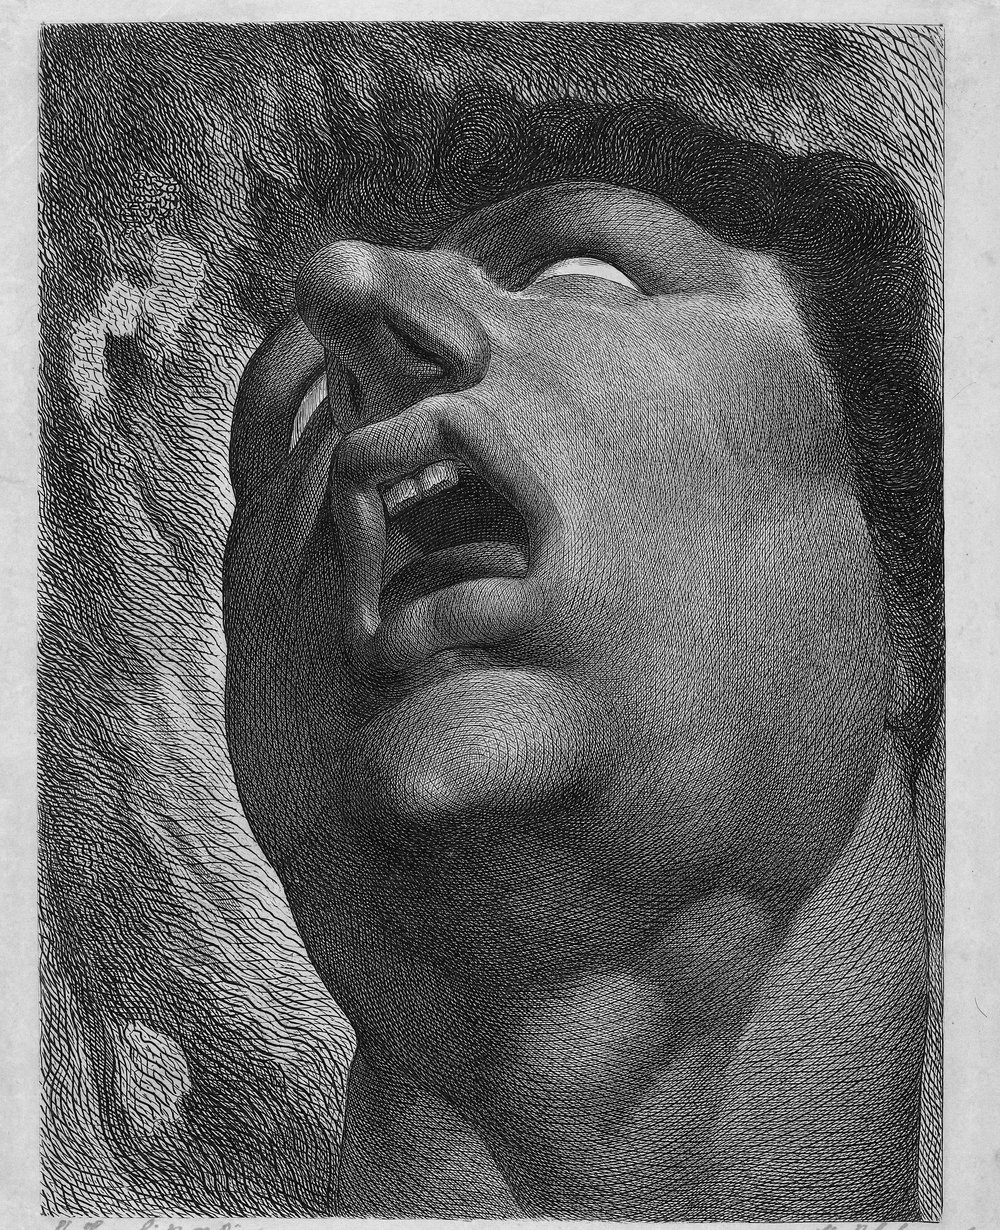 William_Blake_-_Satan.jpg